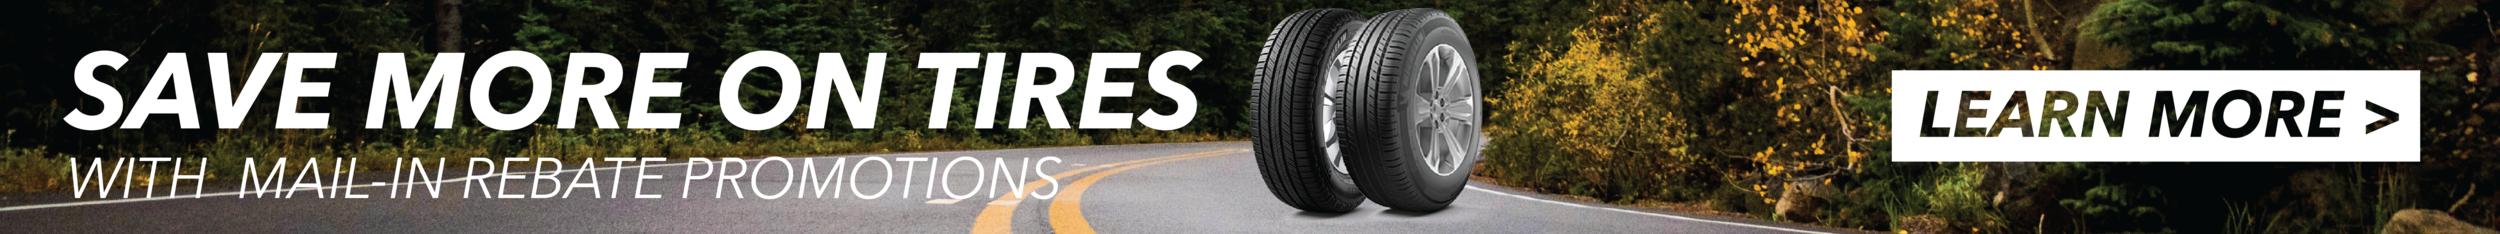 Tire Rebates Banner.png